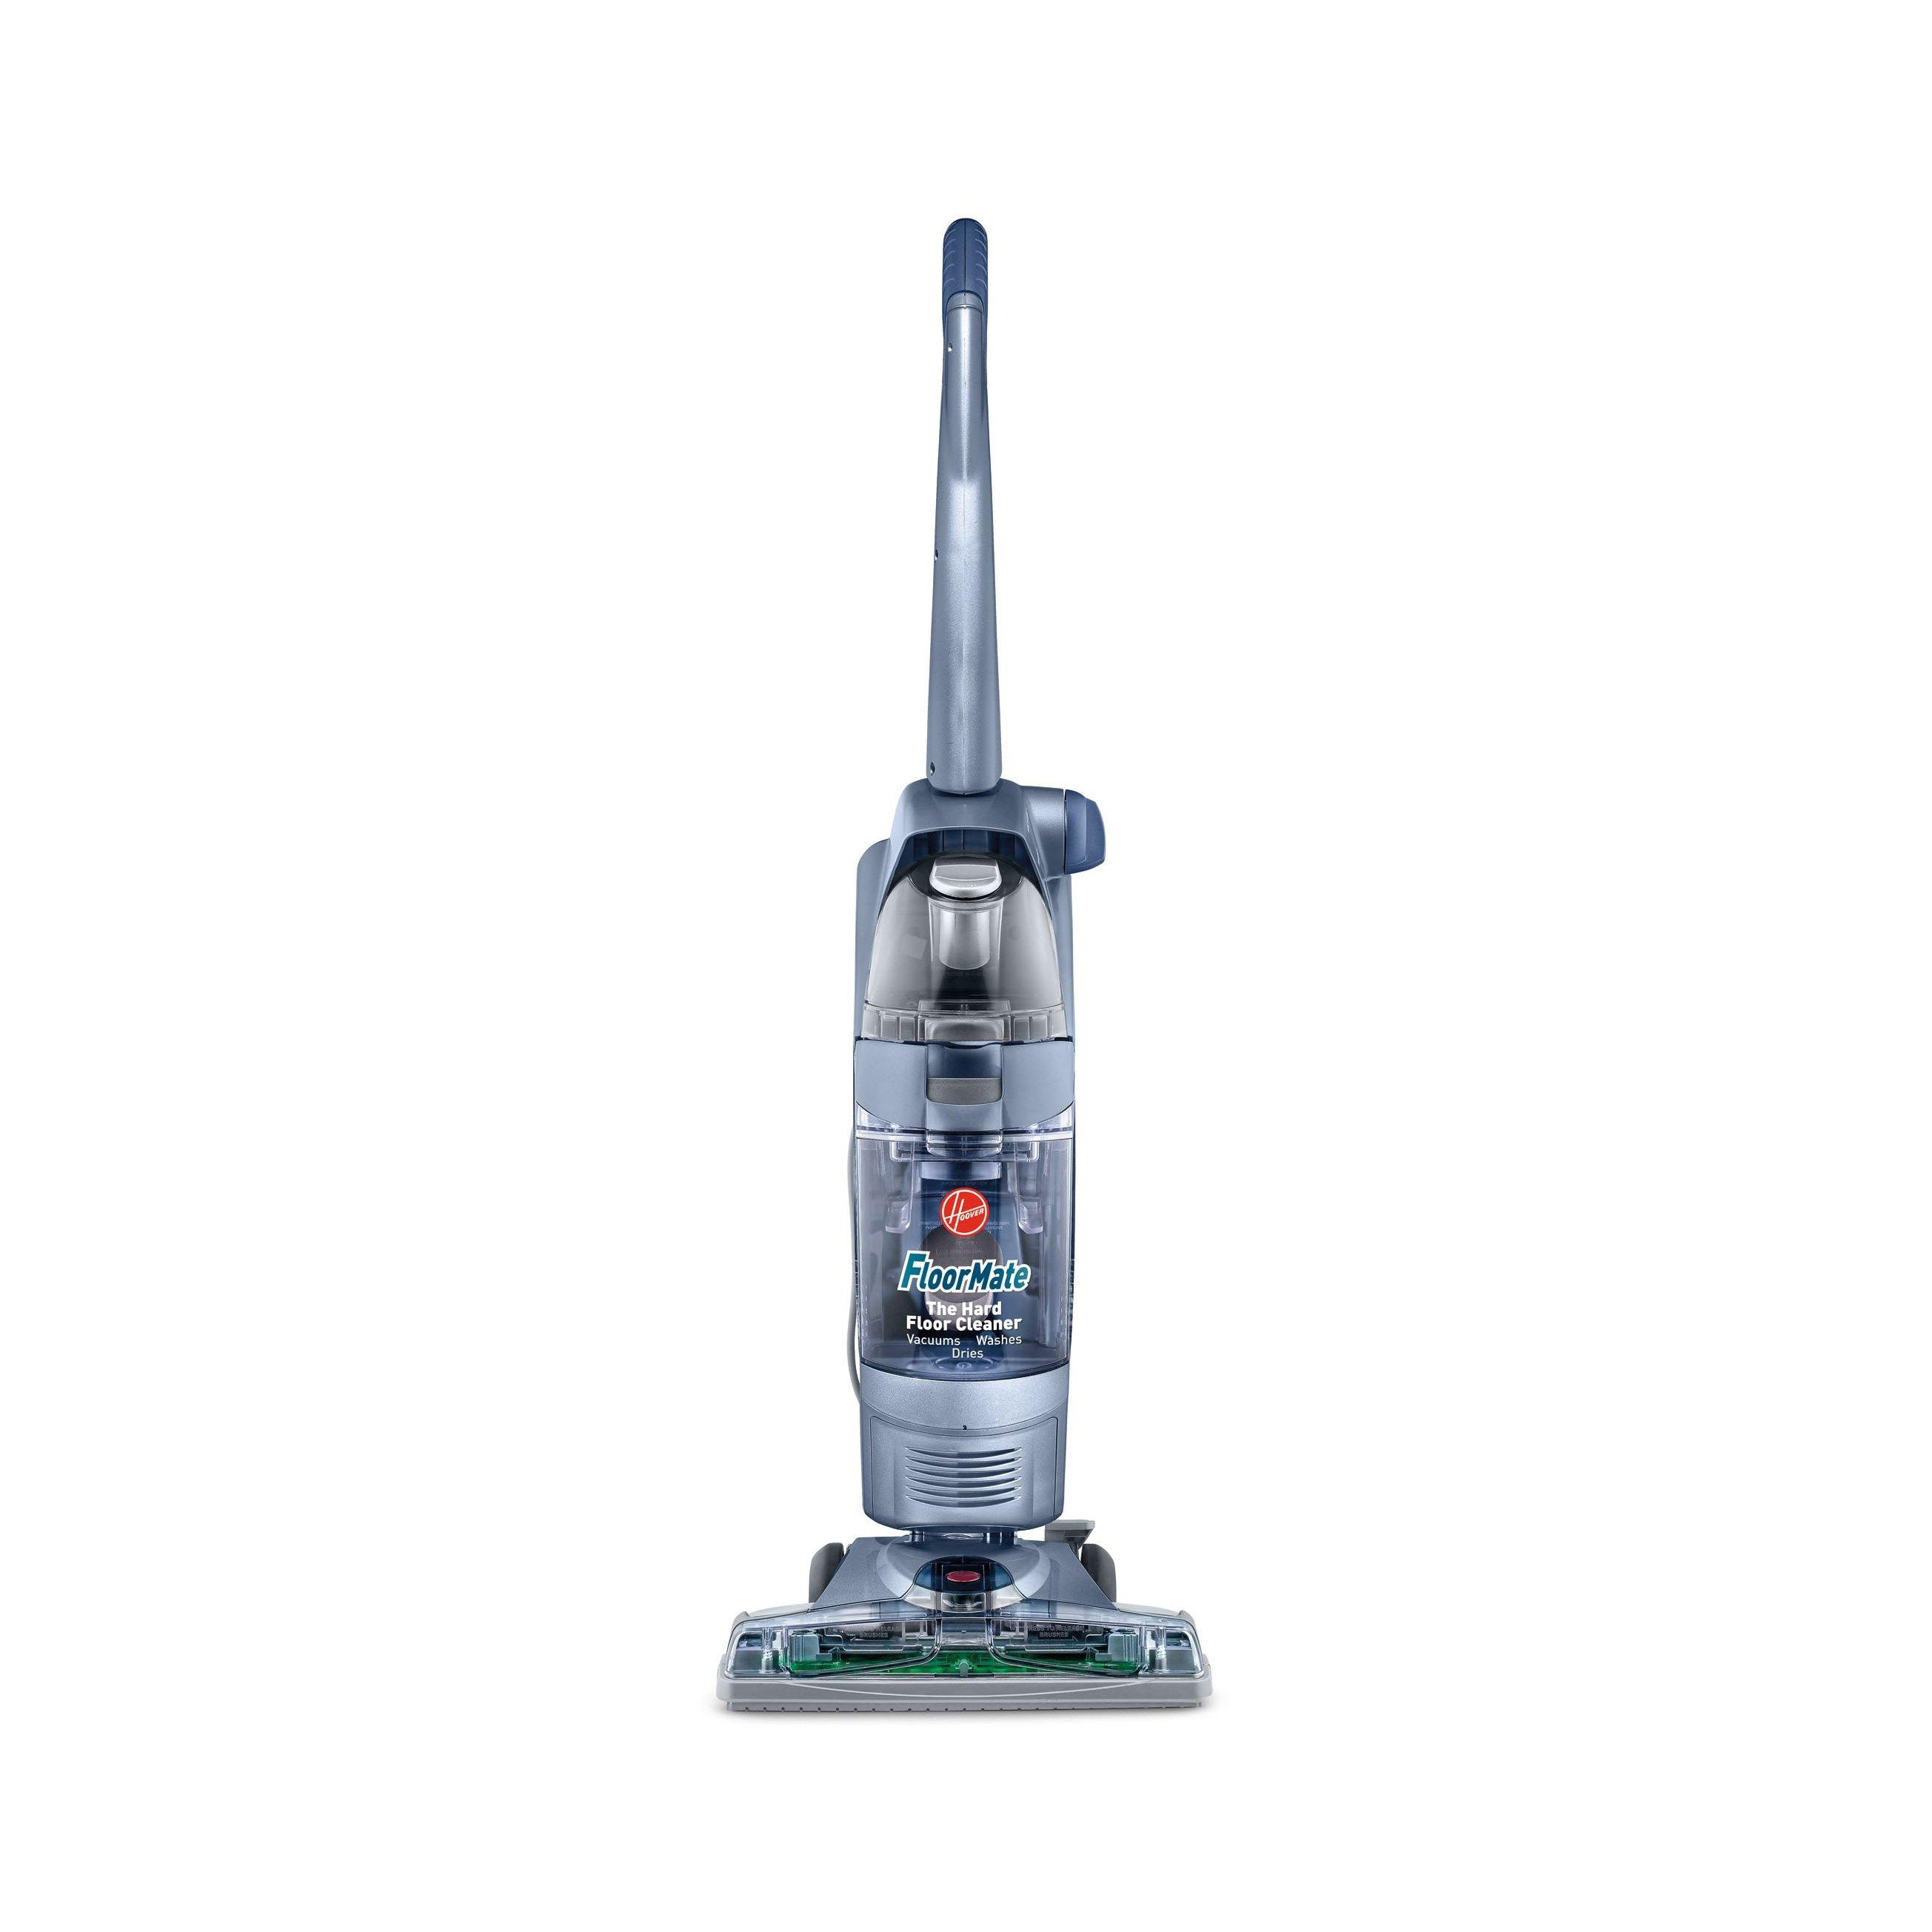 FloorMate SpinScrub 3-in-1 Hard Floor Cleaner